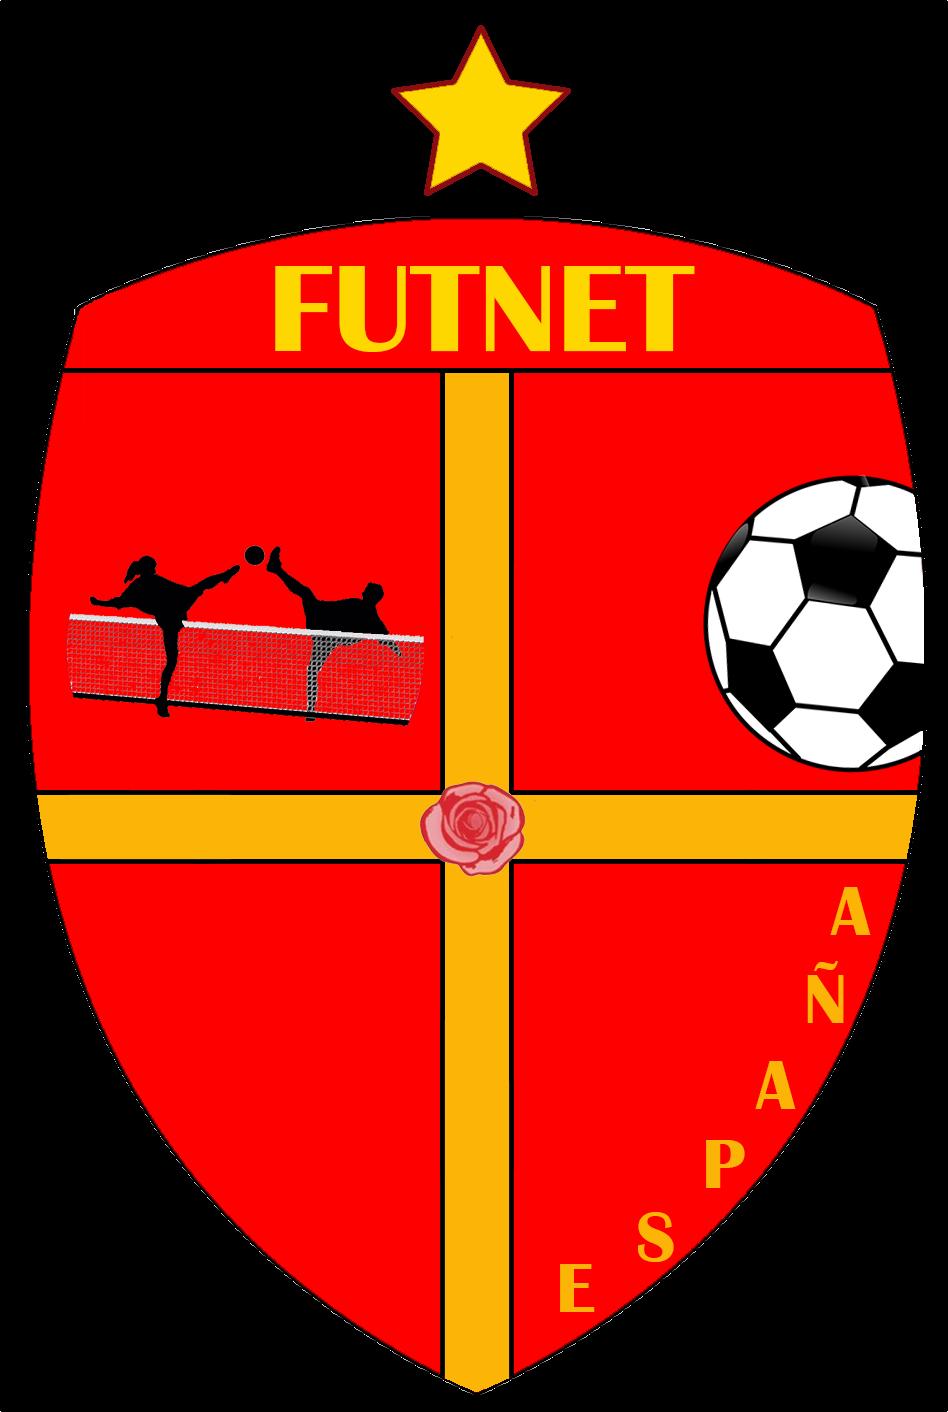 FUTNET ESPAÑA